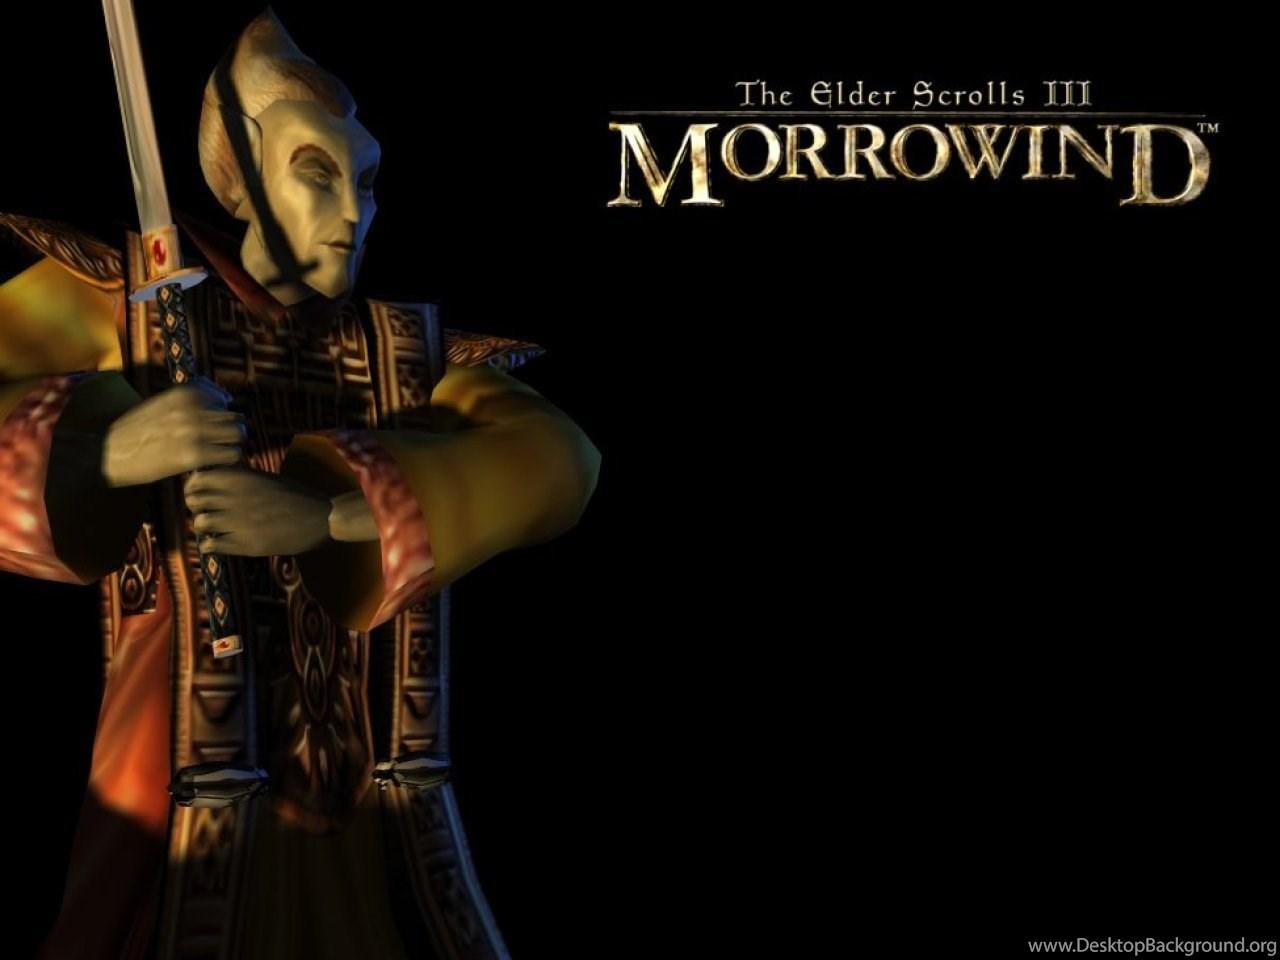 The Elder Scrolls Iii Morrowind Wallpapers Page 2 The Elder